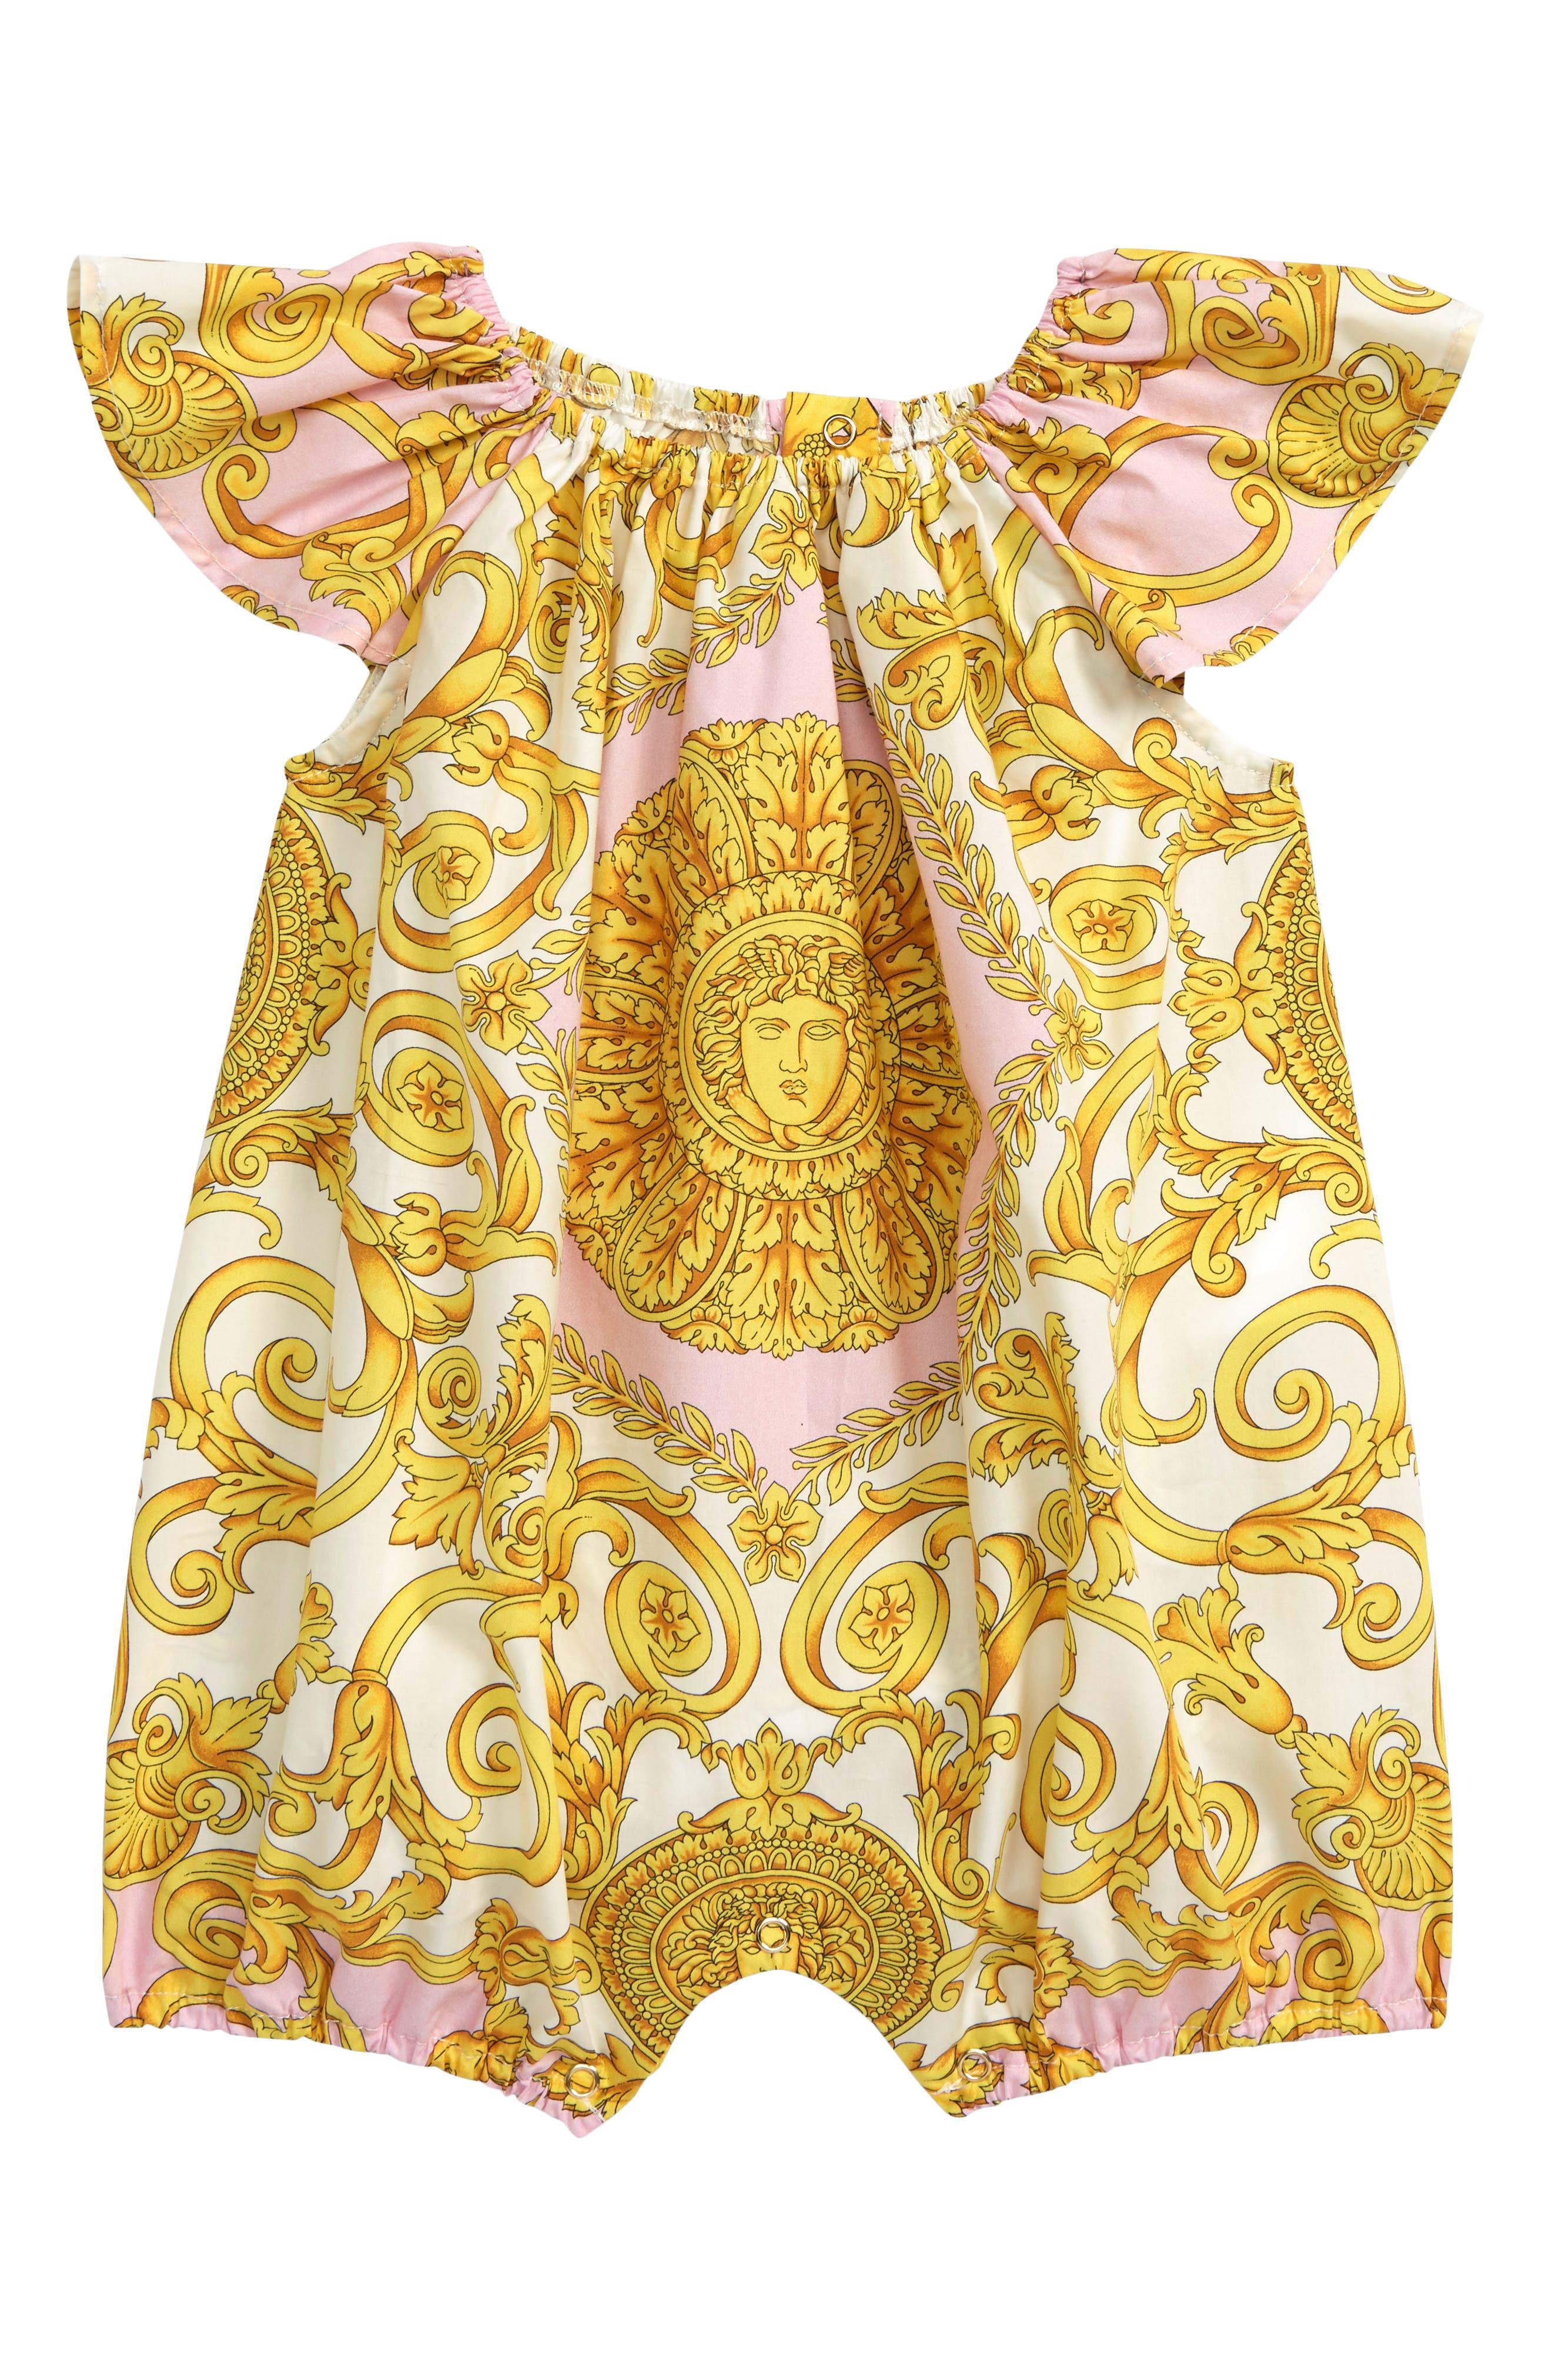 VERSACE, Barocco Print Romper, Main thumbnail 1, color, PINK/GOLD